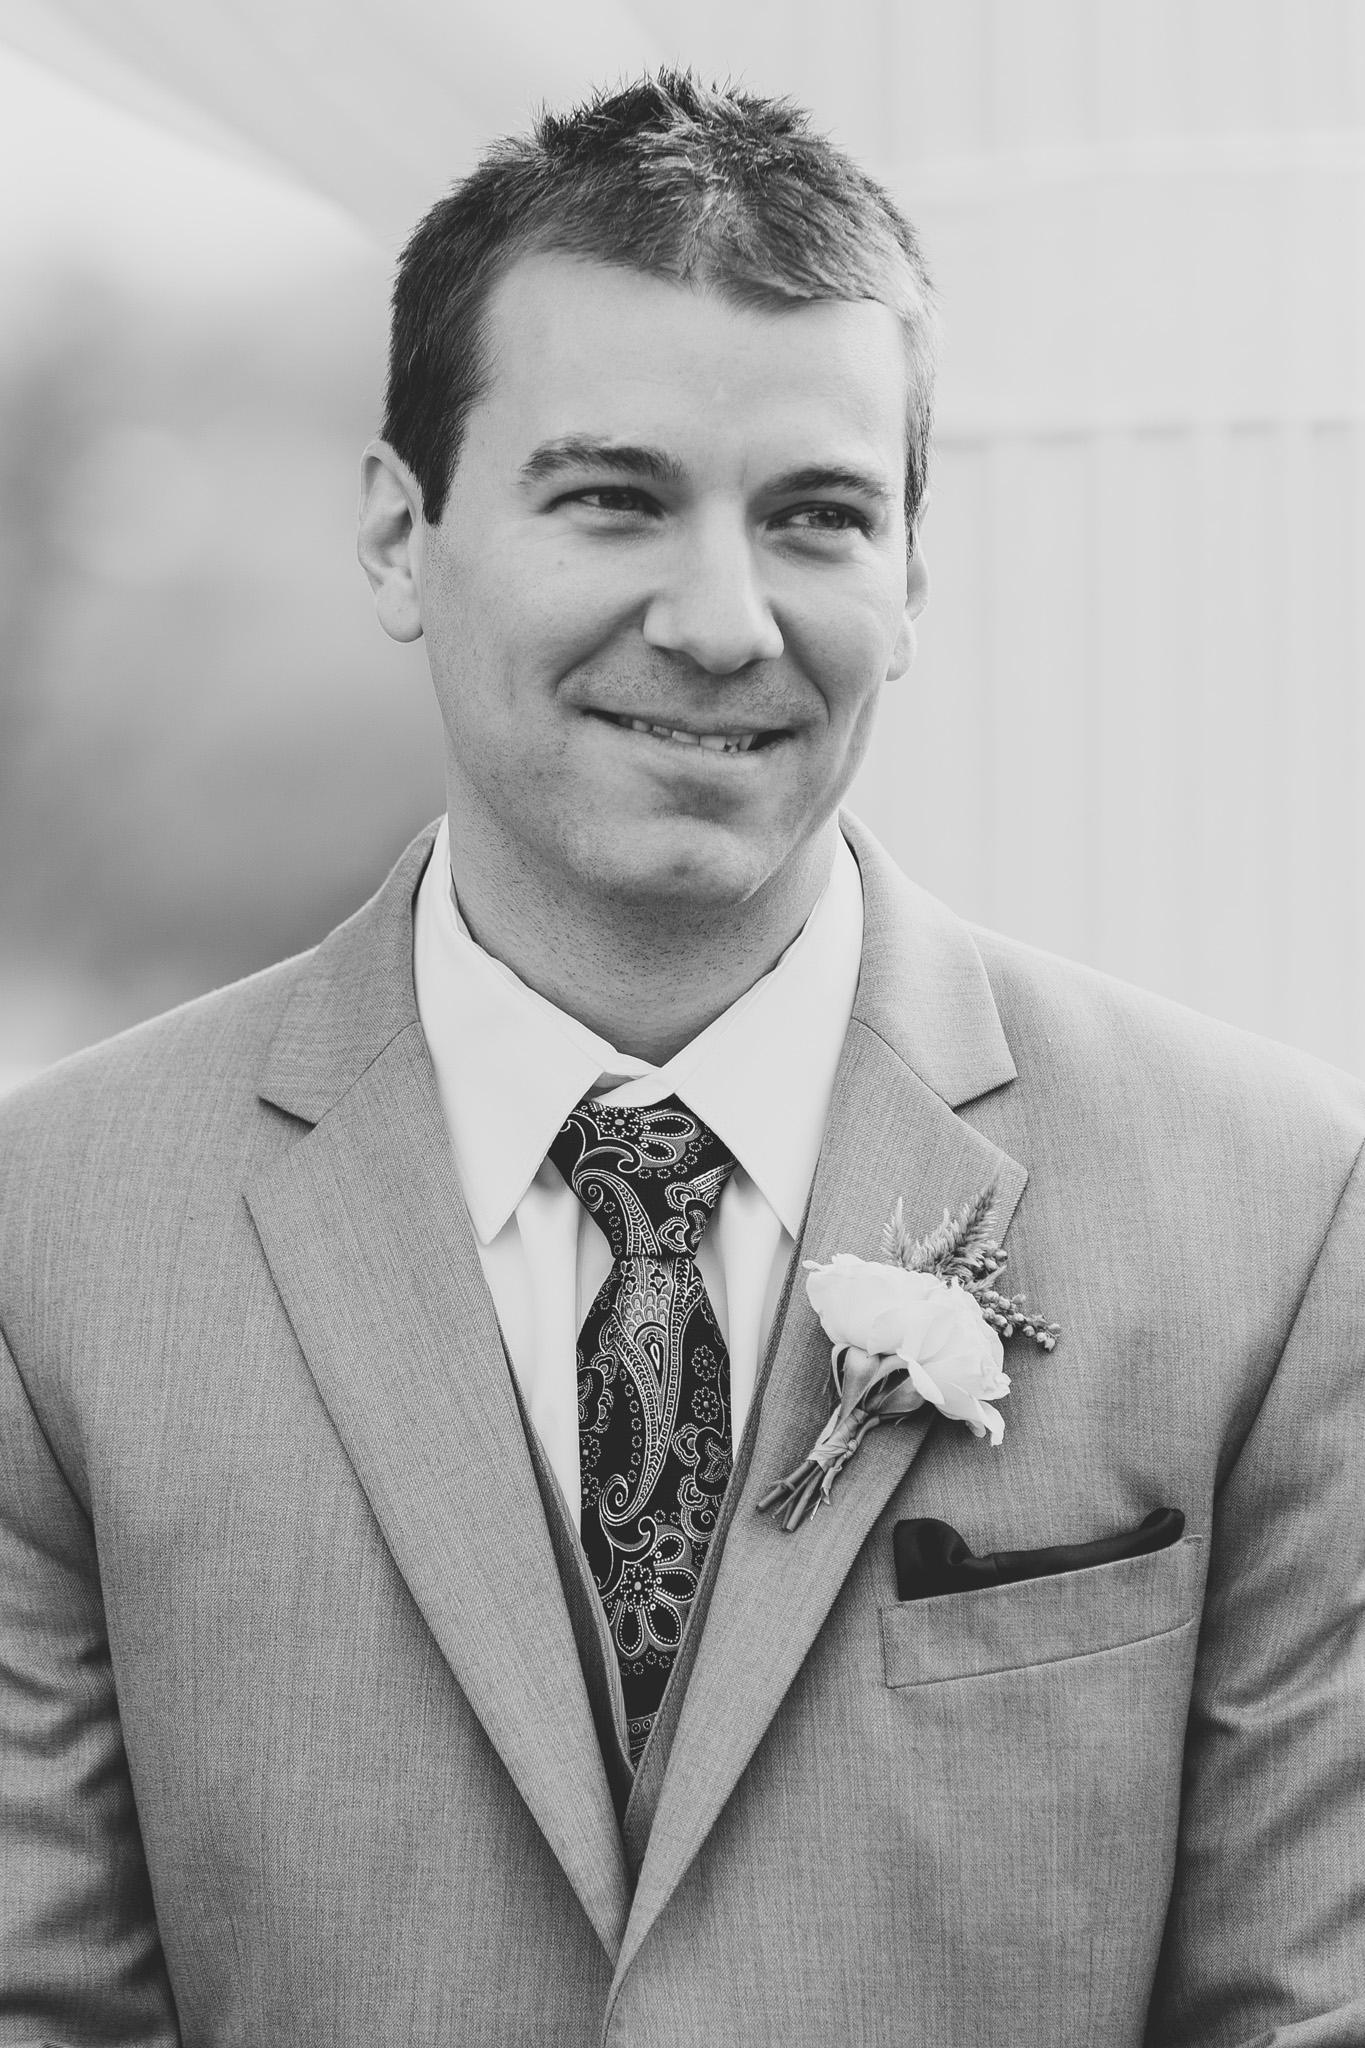 West Manor Wedding_Lynchburg VA_Classic_Black tie_Forest VA_Wedding_photos2046.jpg